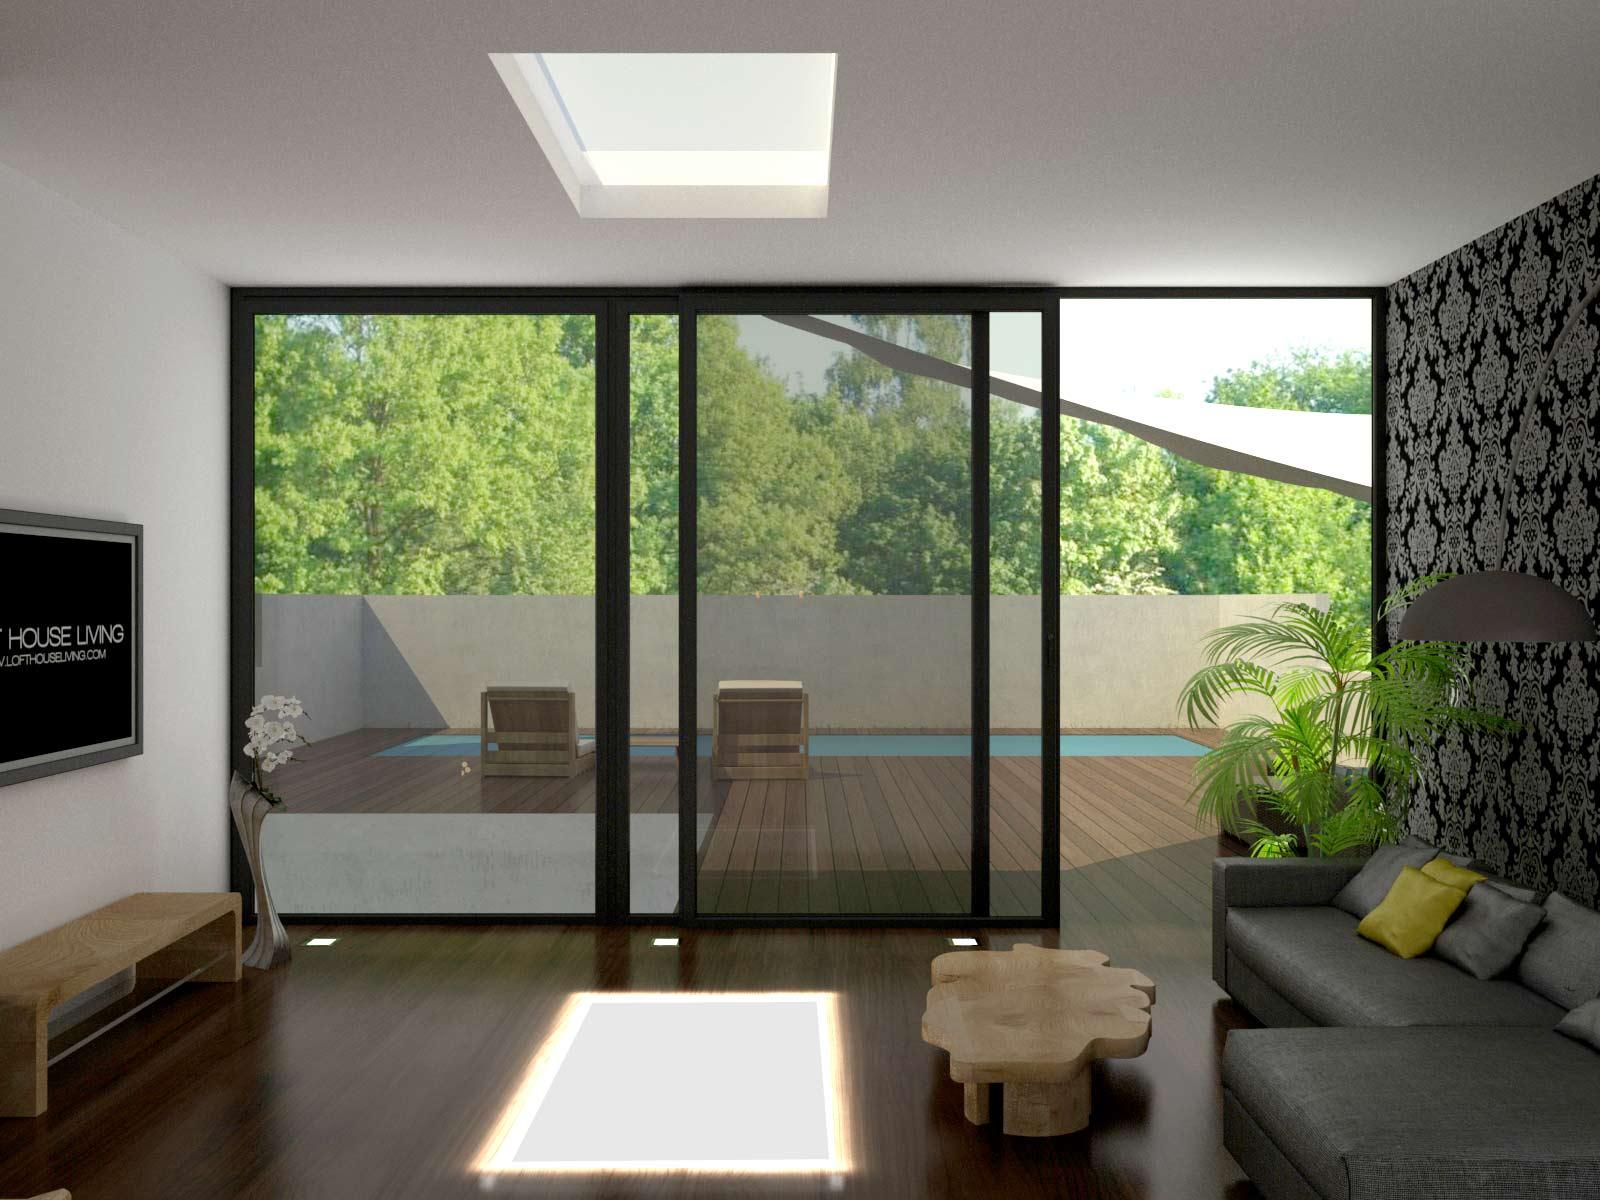 Loft House Living Loft d